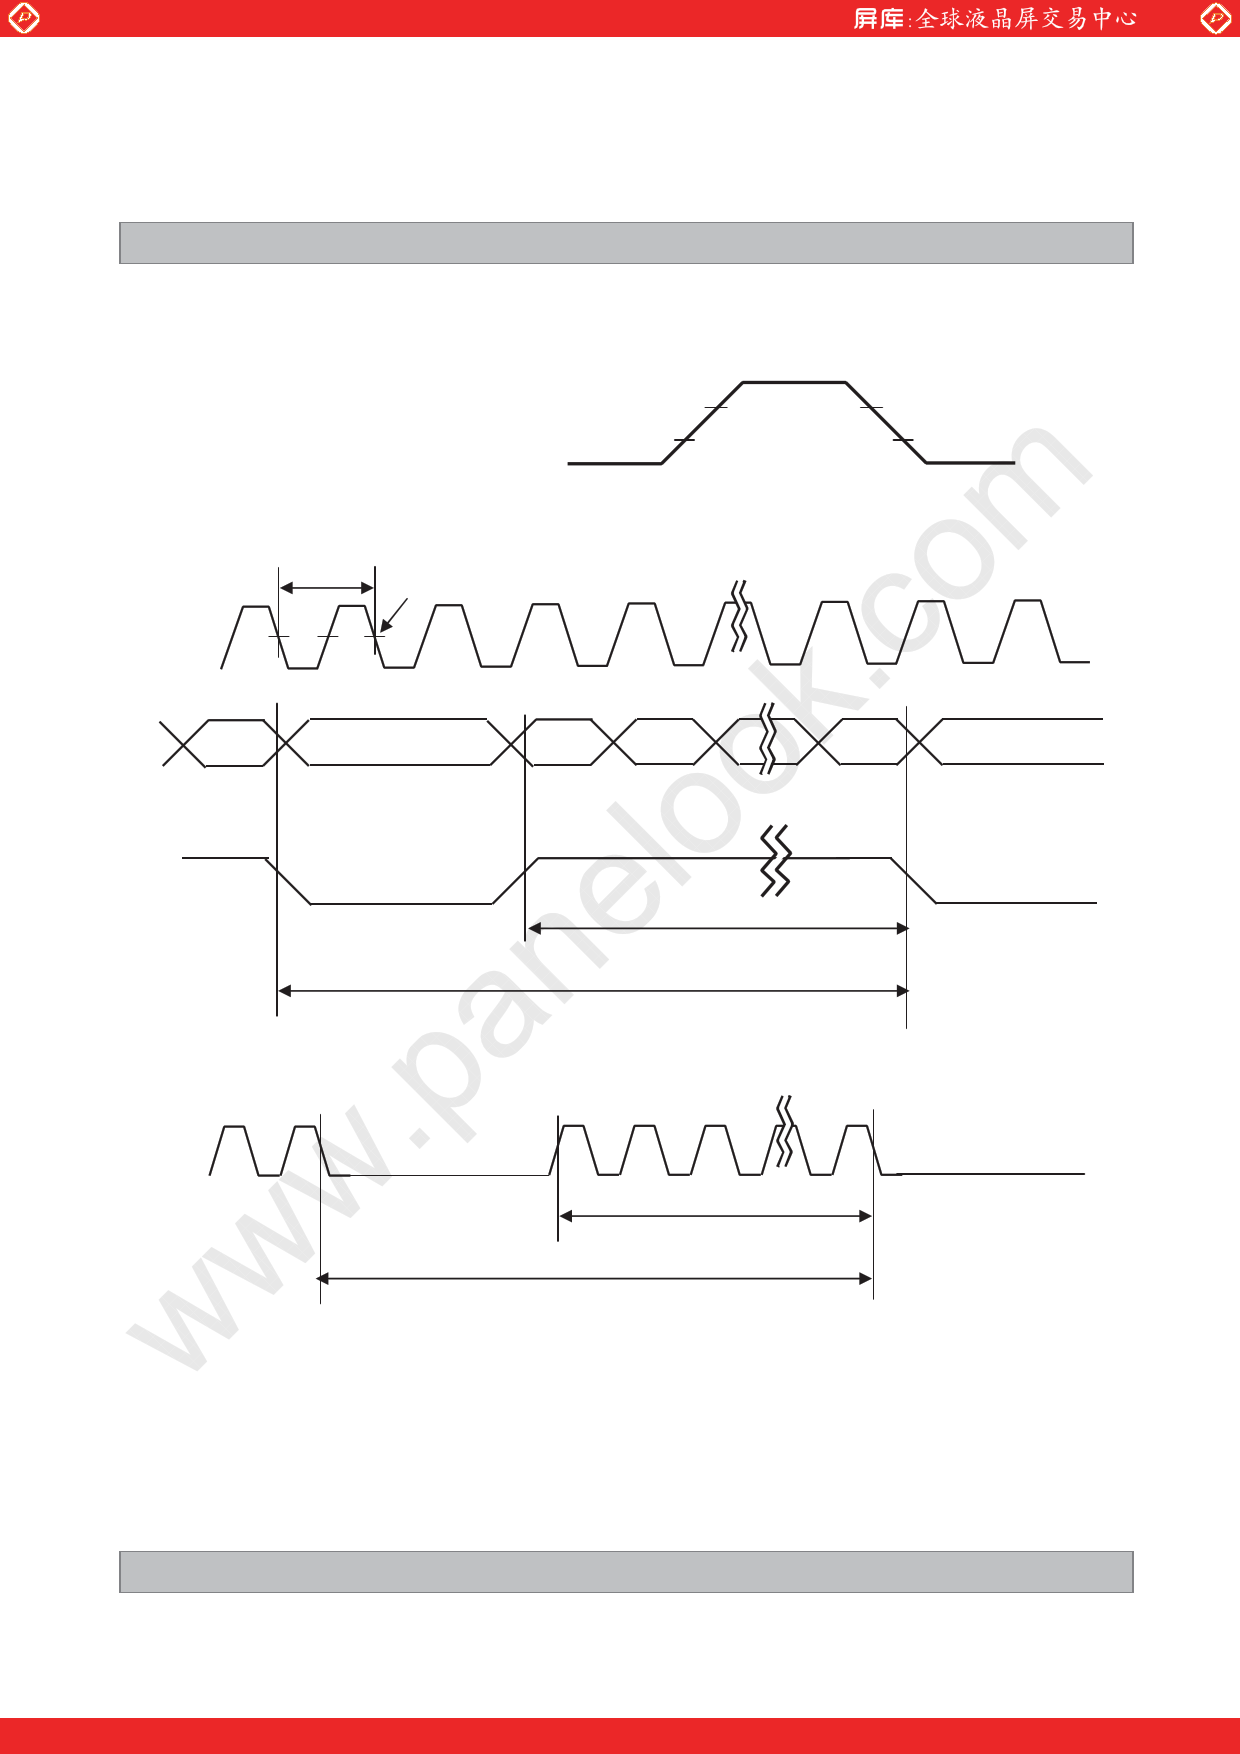 LC320EXN-SEP1 arduino